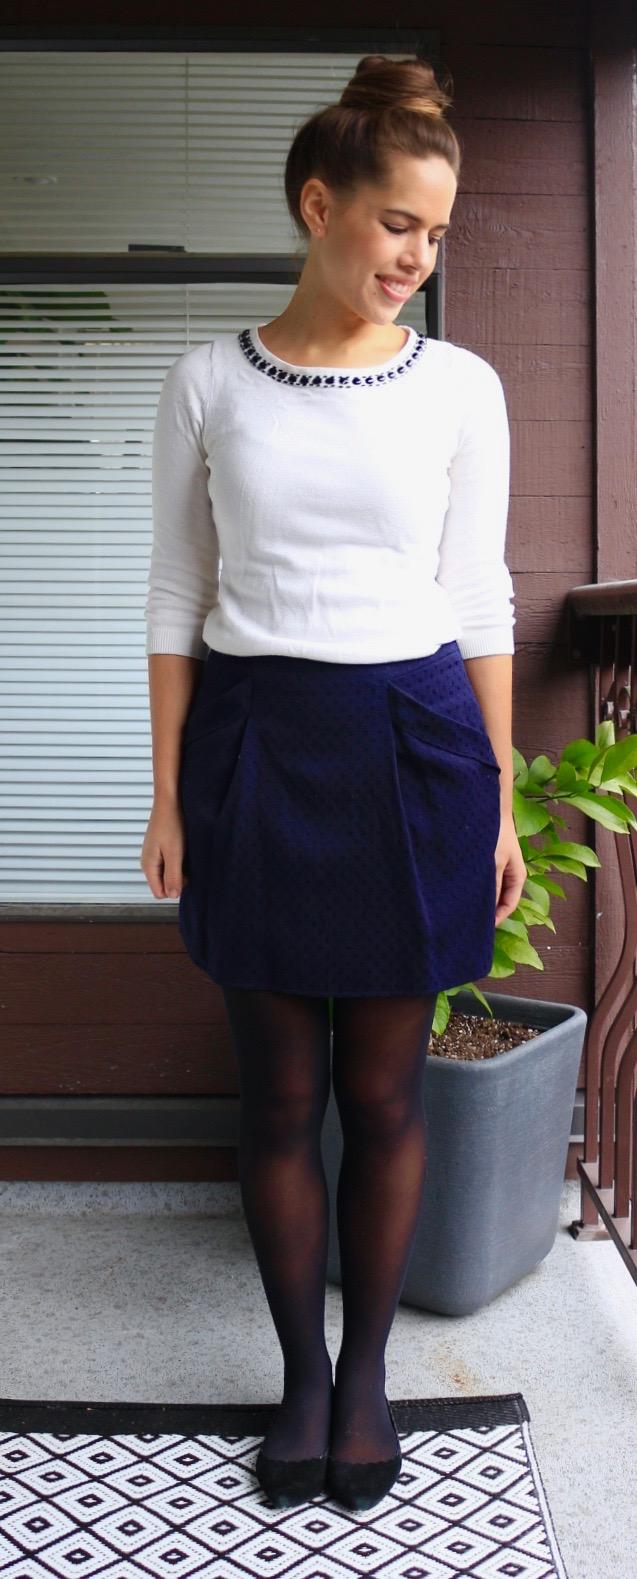 Jules in Flats - Embellished Collar Sweater & Mini Skirt